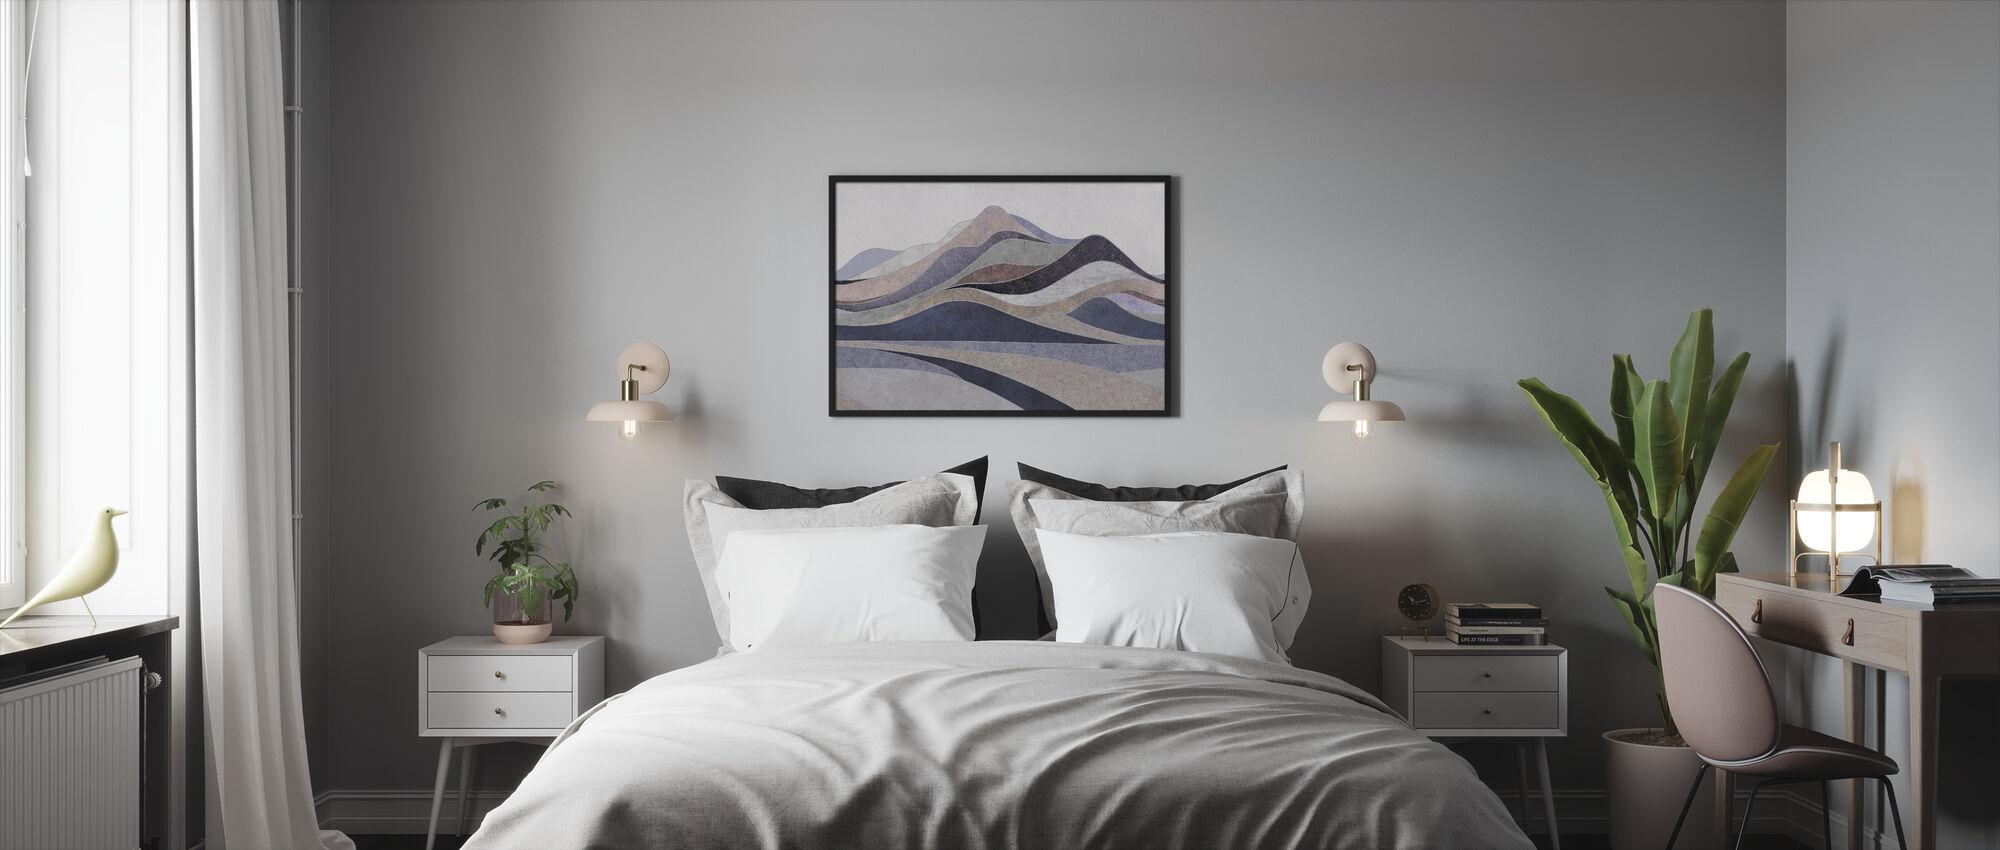 Concord Maisema - Potpourri - Kehystetty kuva - Makuuhuone